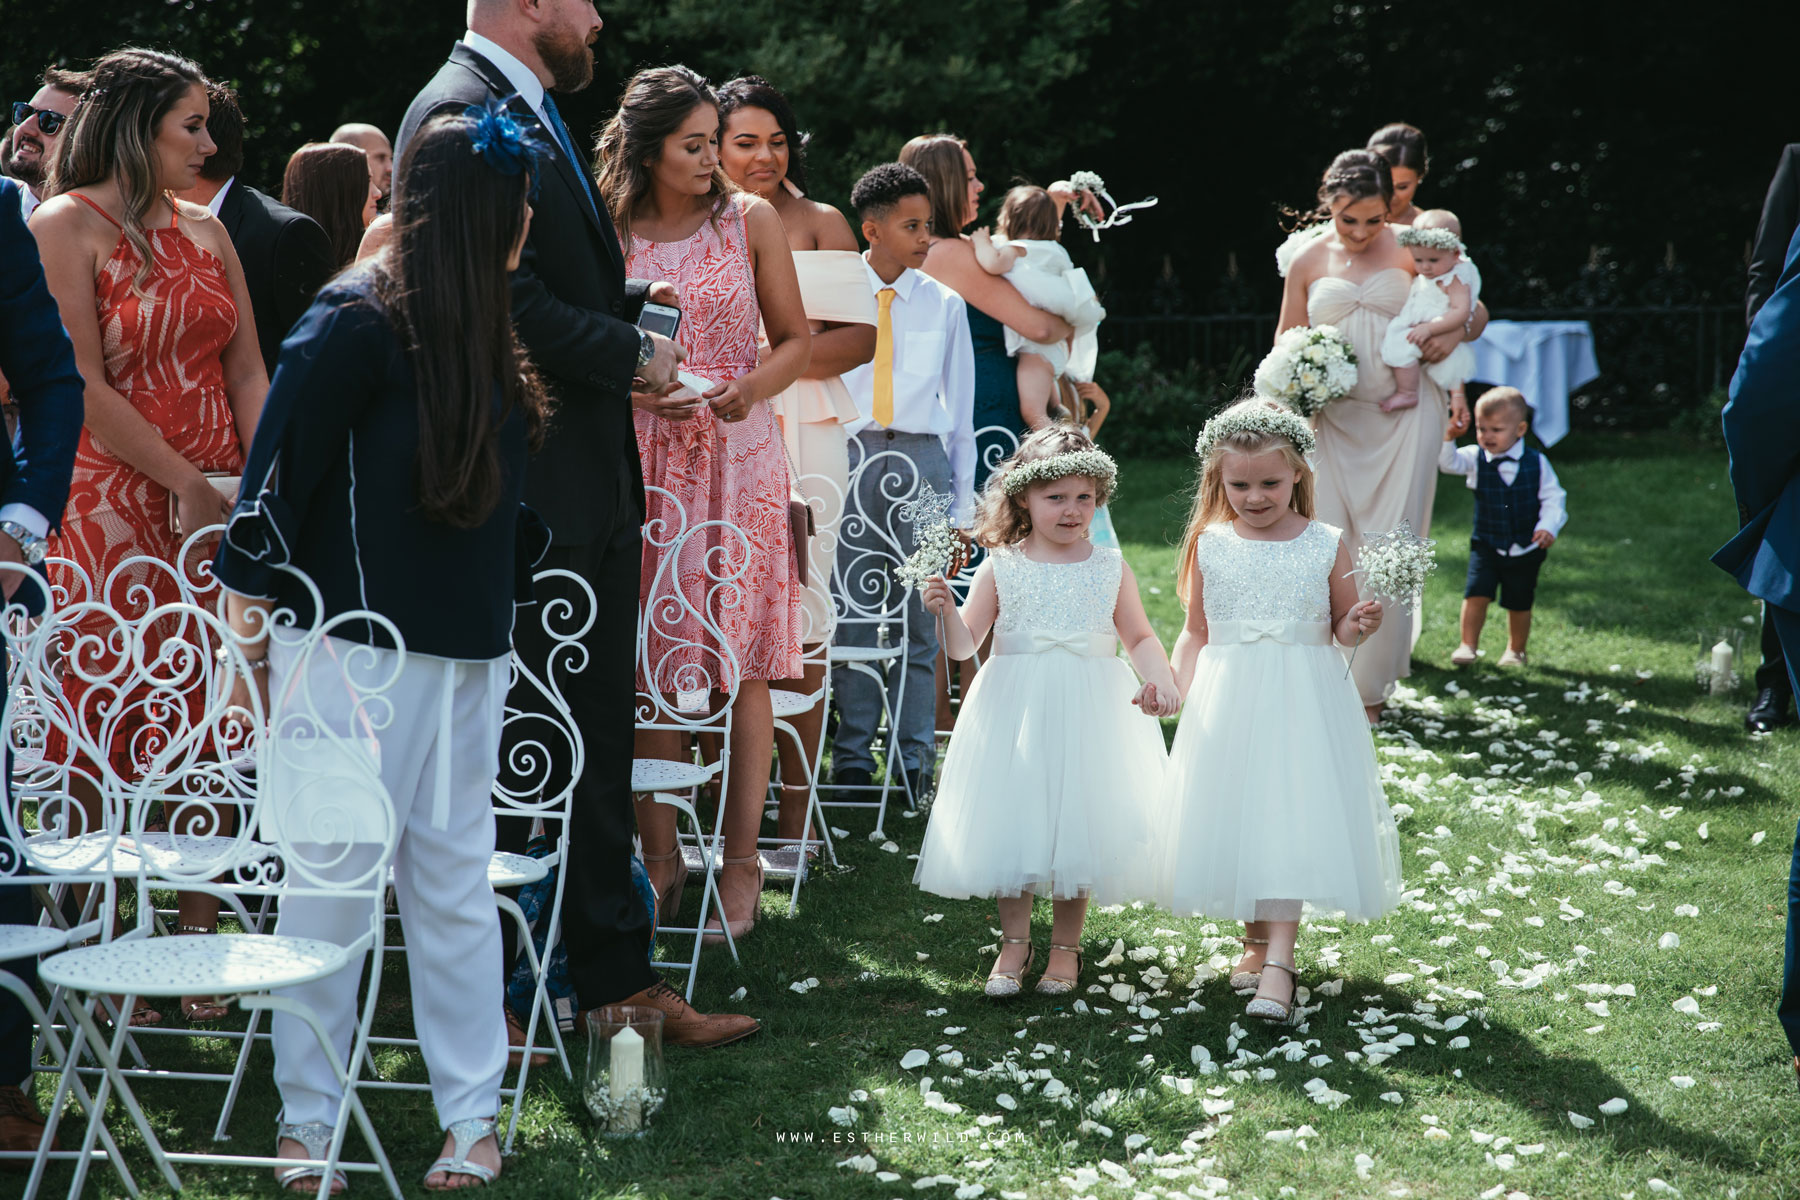 Lynford_Hall_Wedding_Thetford_Mundford_Esther_Wild_Photographer_IMG_1227.jpg